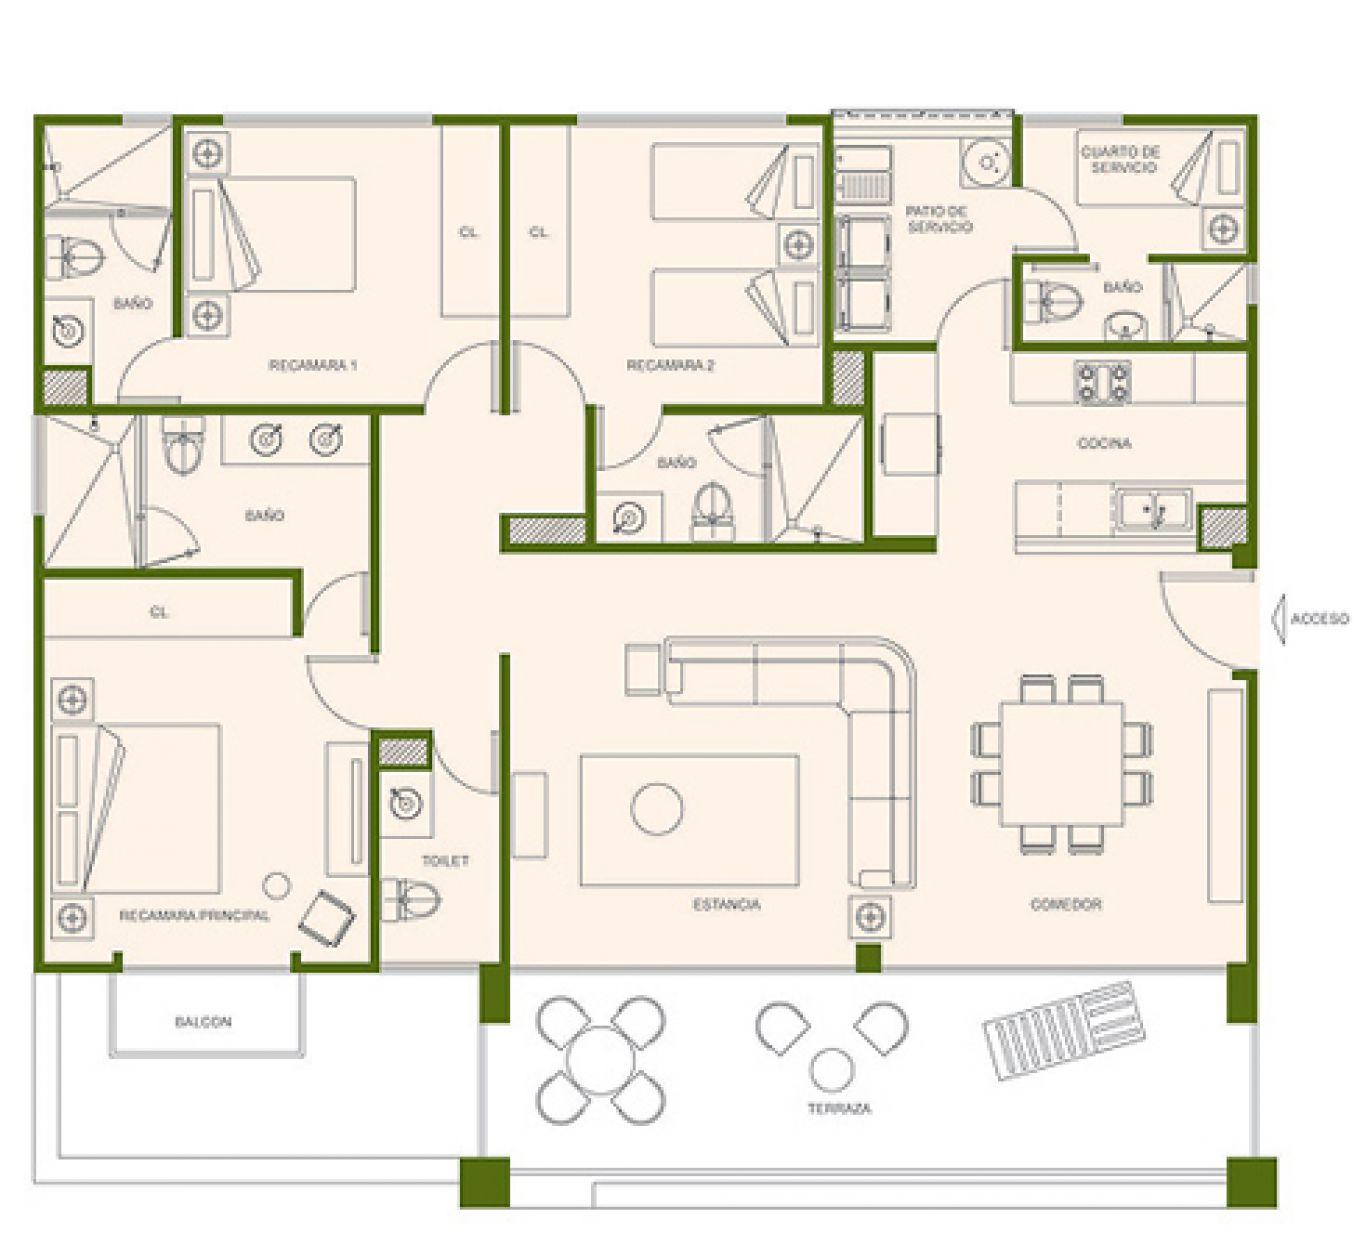 Residencial paraíso country club, id 1525184, no 1, plano de eagle, 409